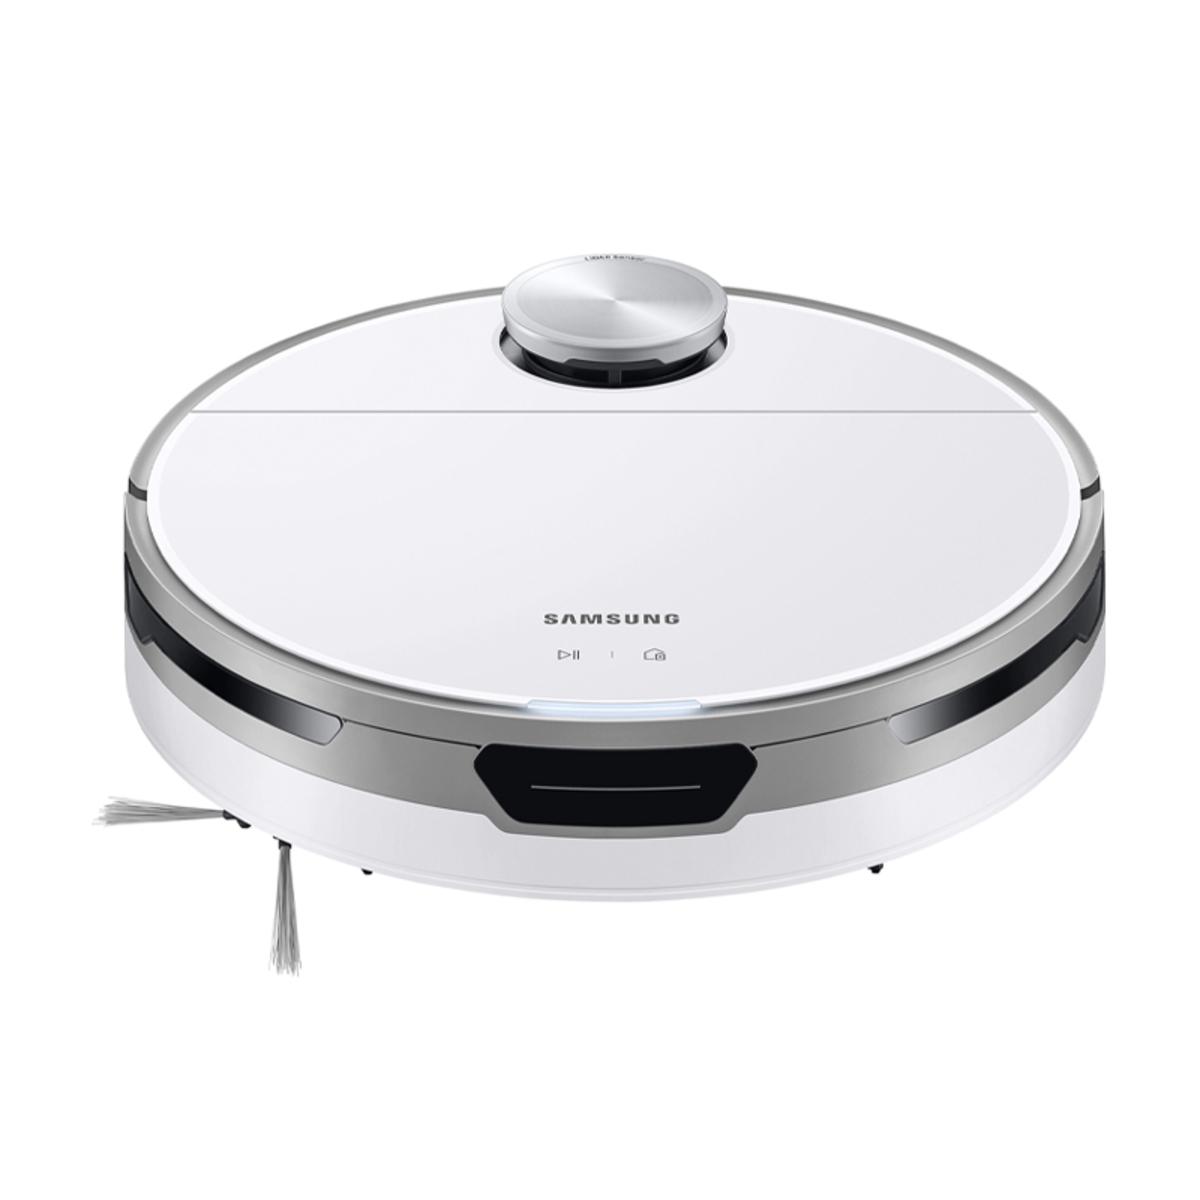 Samsung VR30T85513W Jet Bot+ Robot Vacuum Cleaner